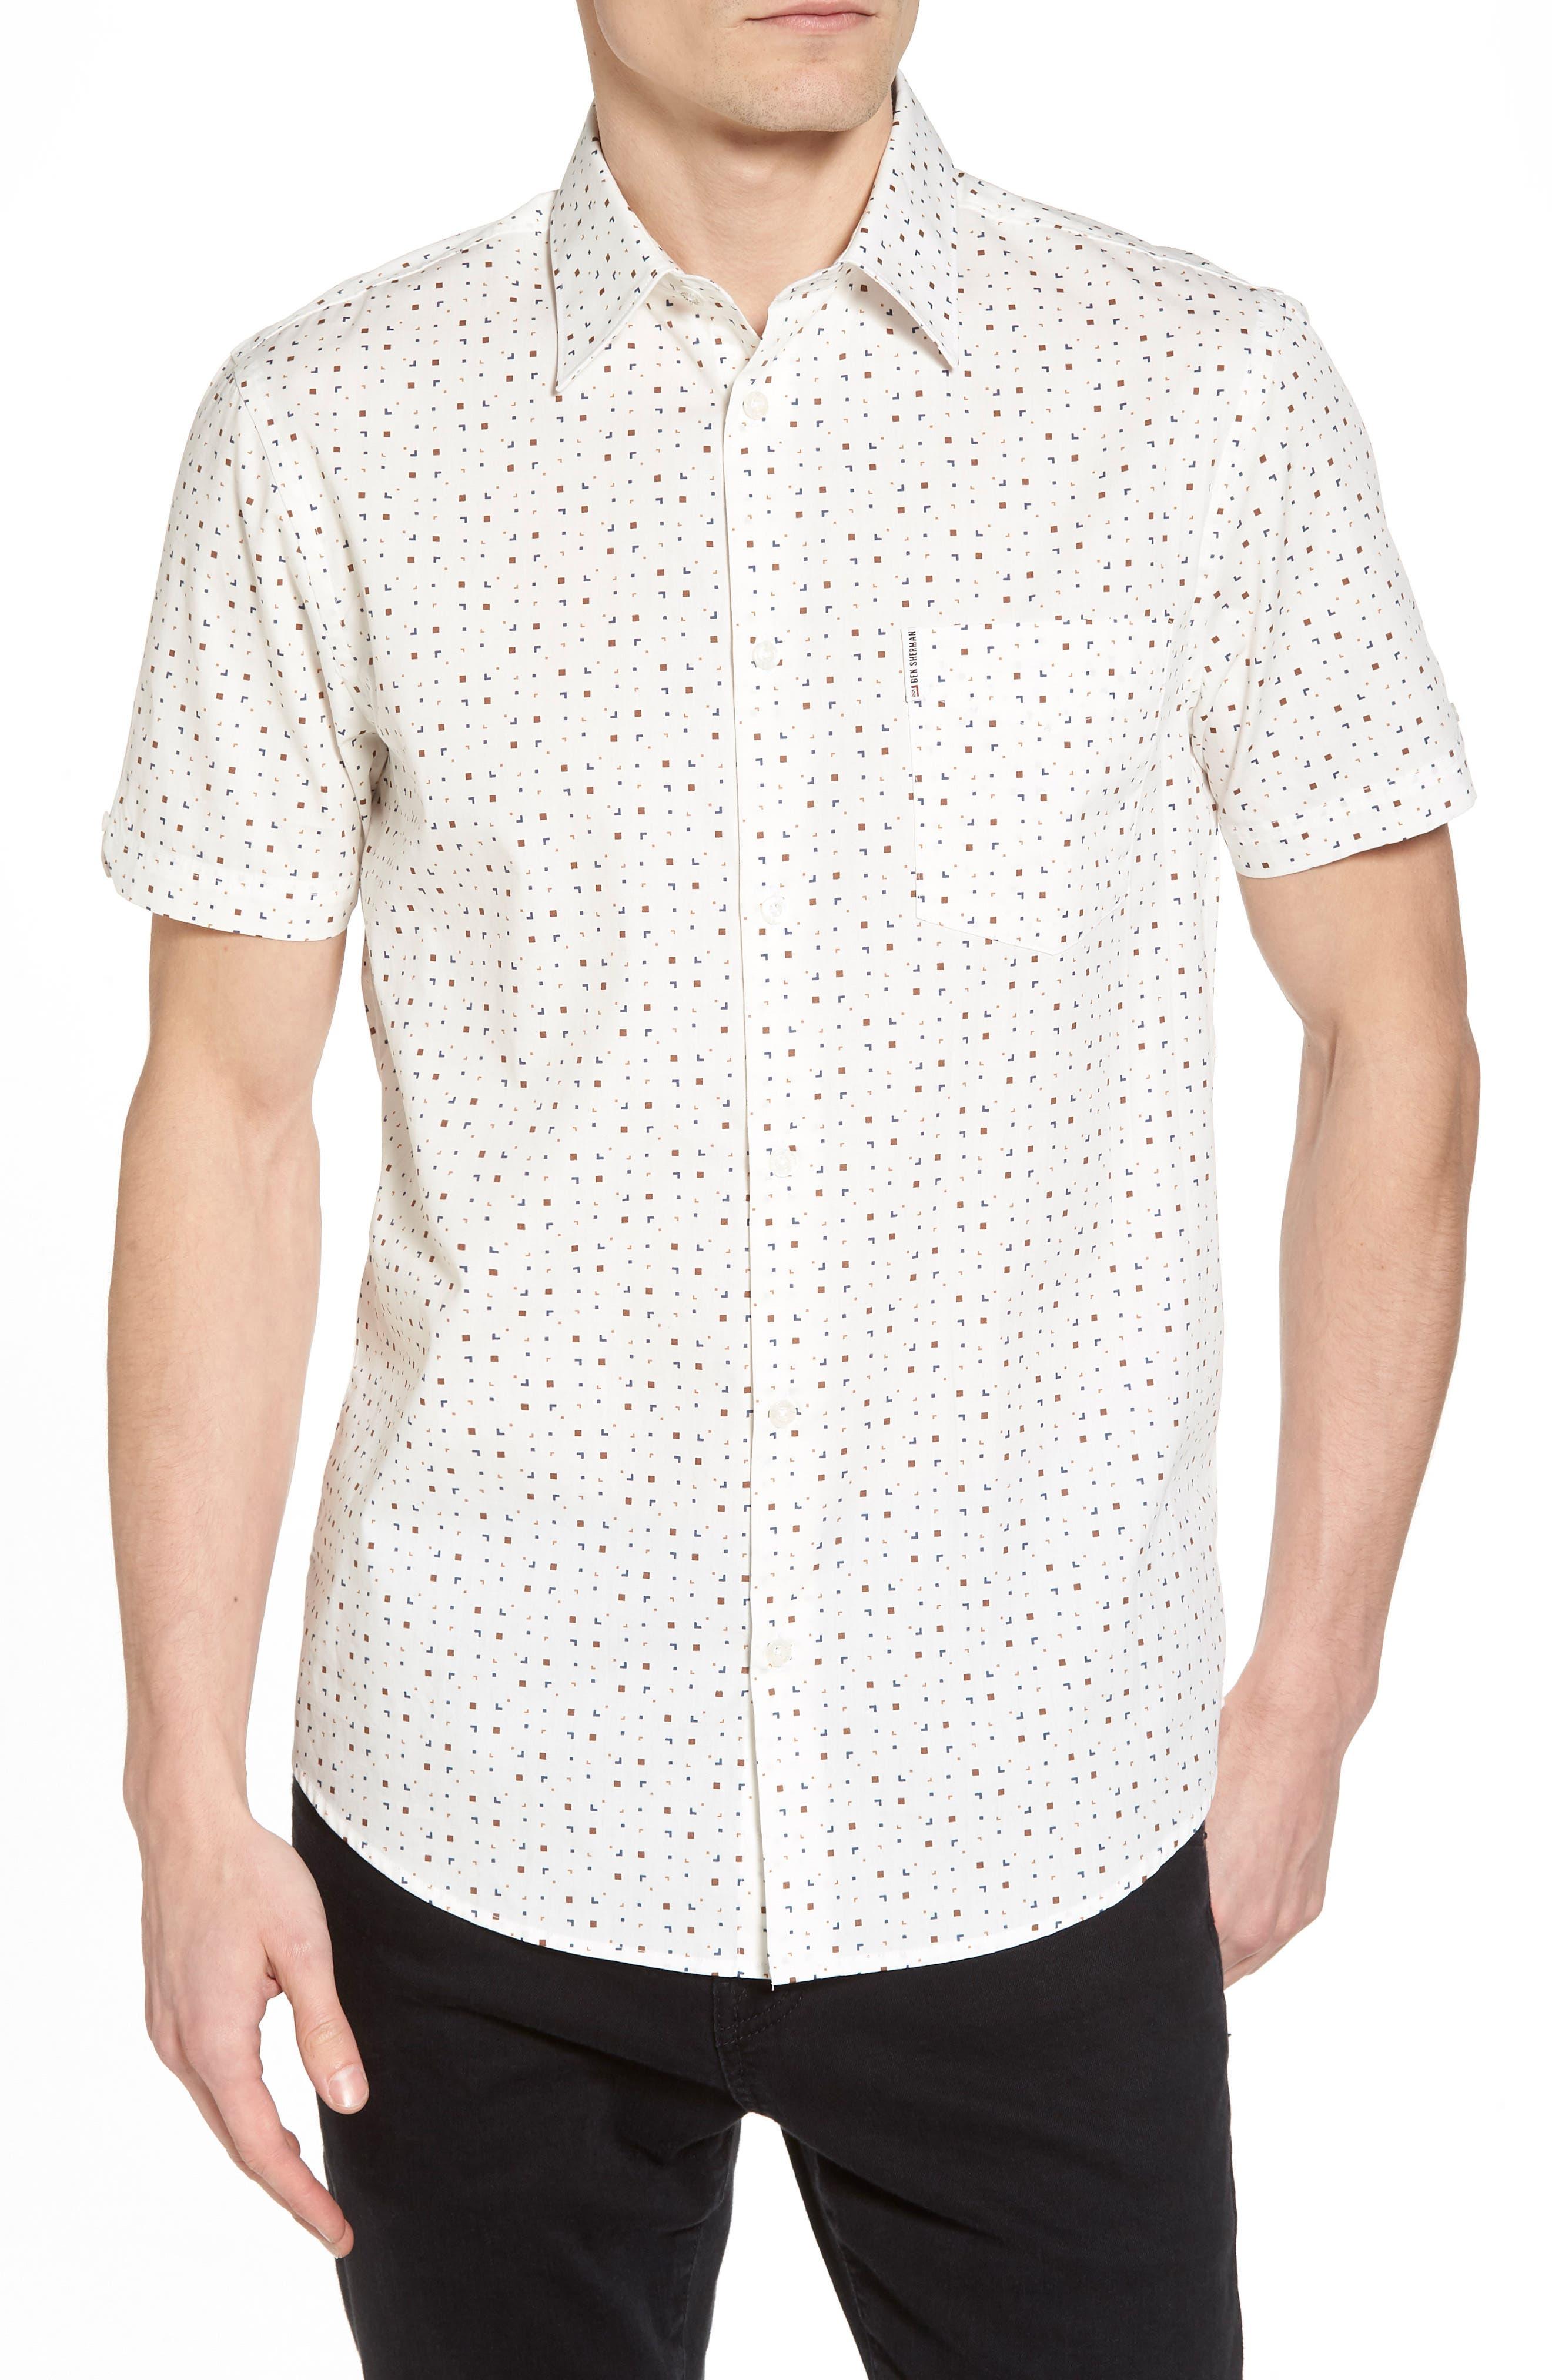 Ben Sherman Scattered Geo Woven Shirt